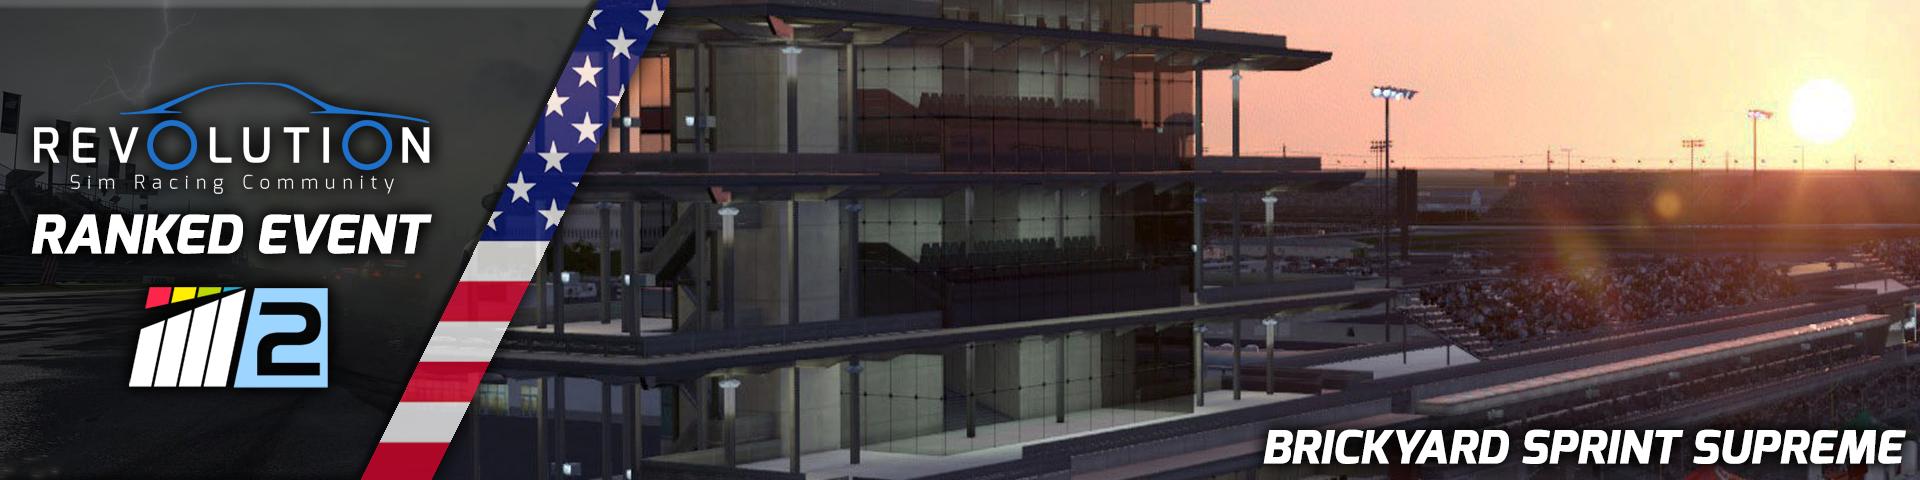 Banner - Brickyard Sprint Supreme.png